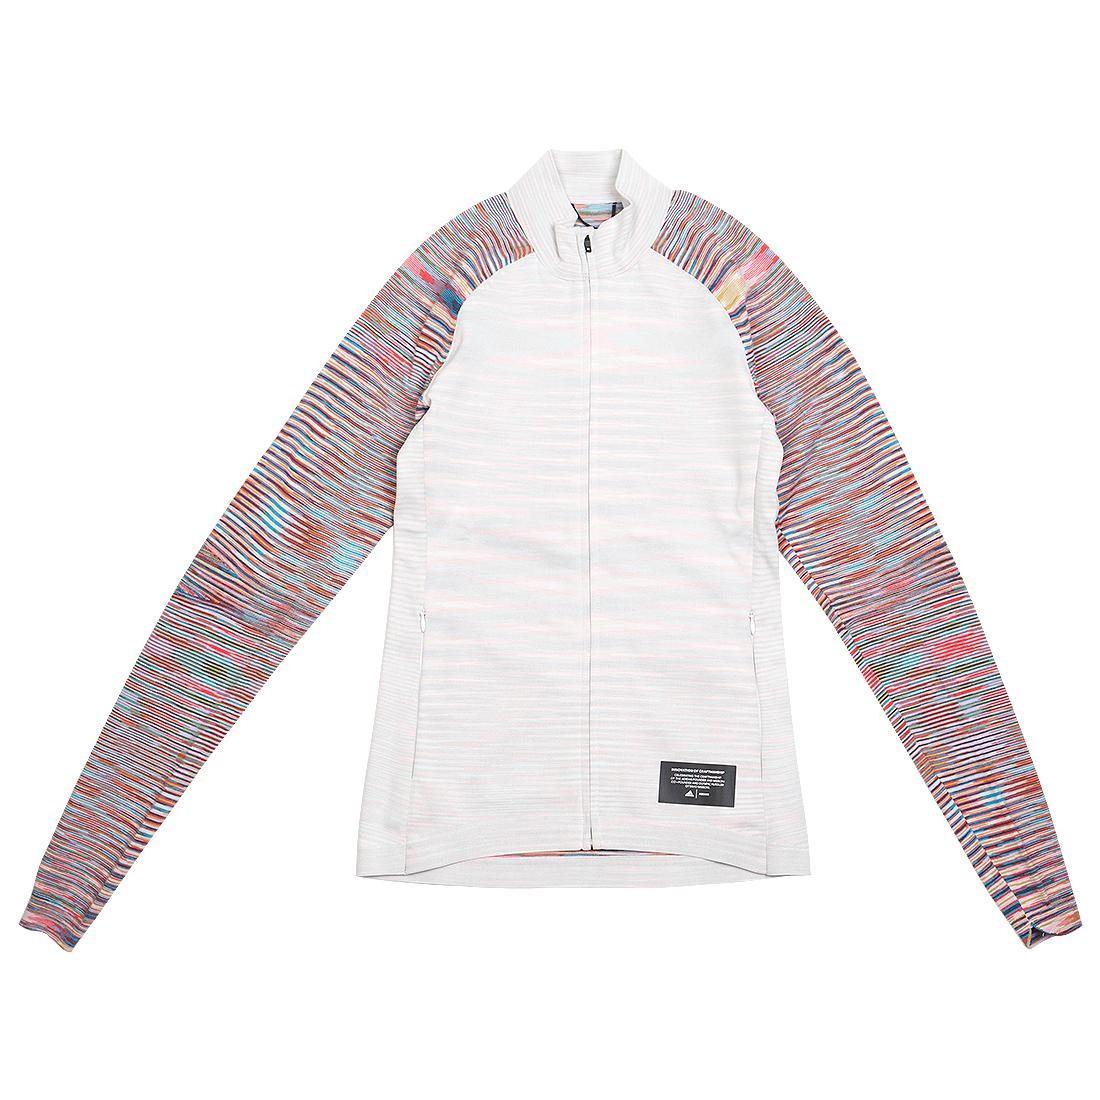 Adidas x Missoni Women PHX Jacket (multi)